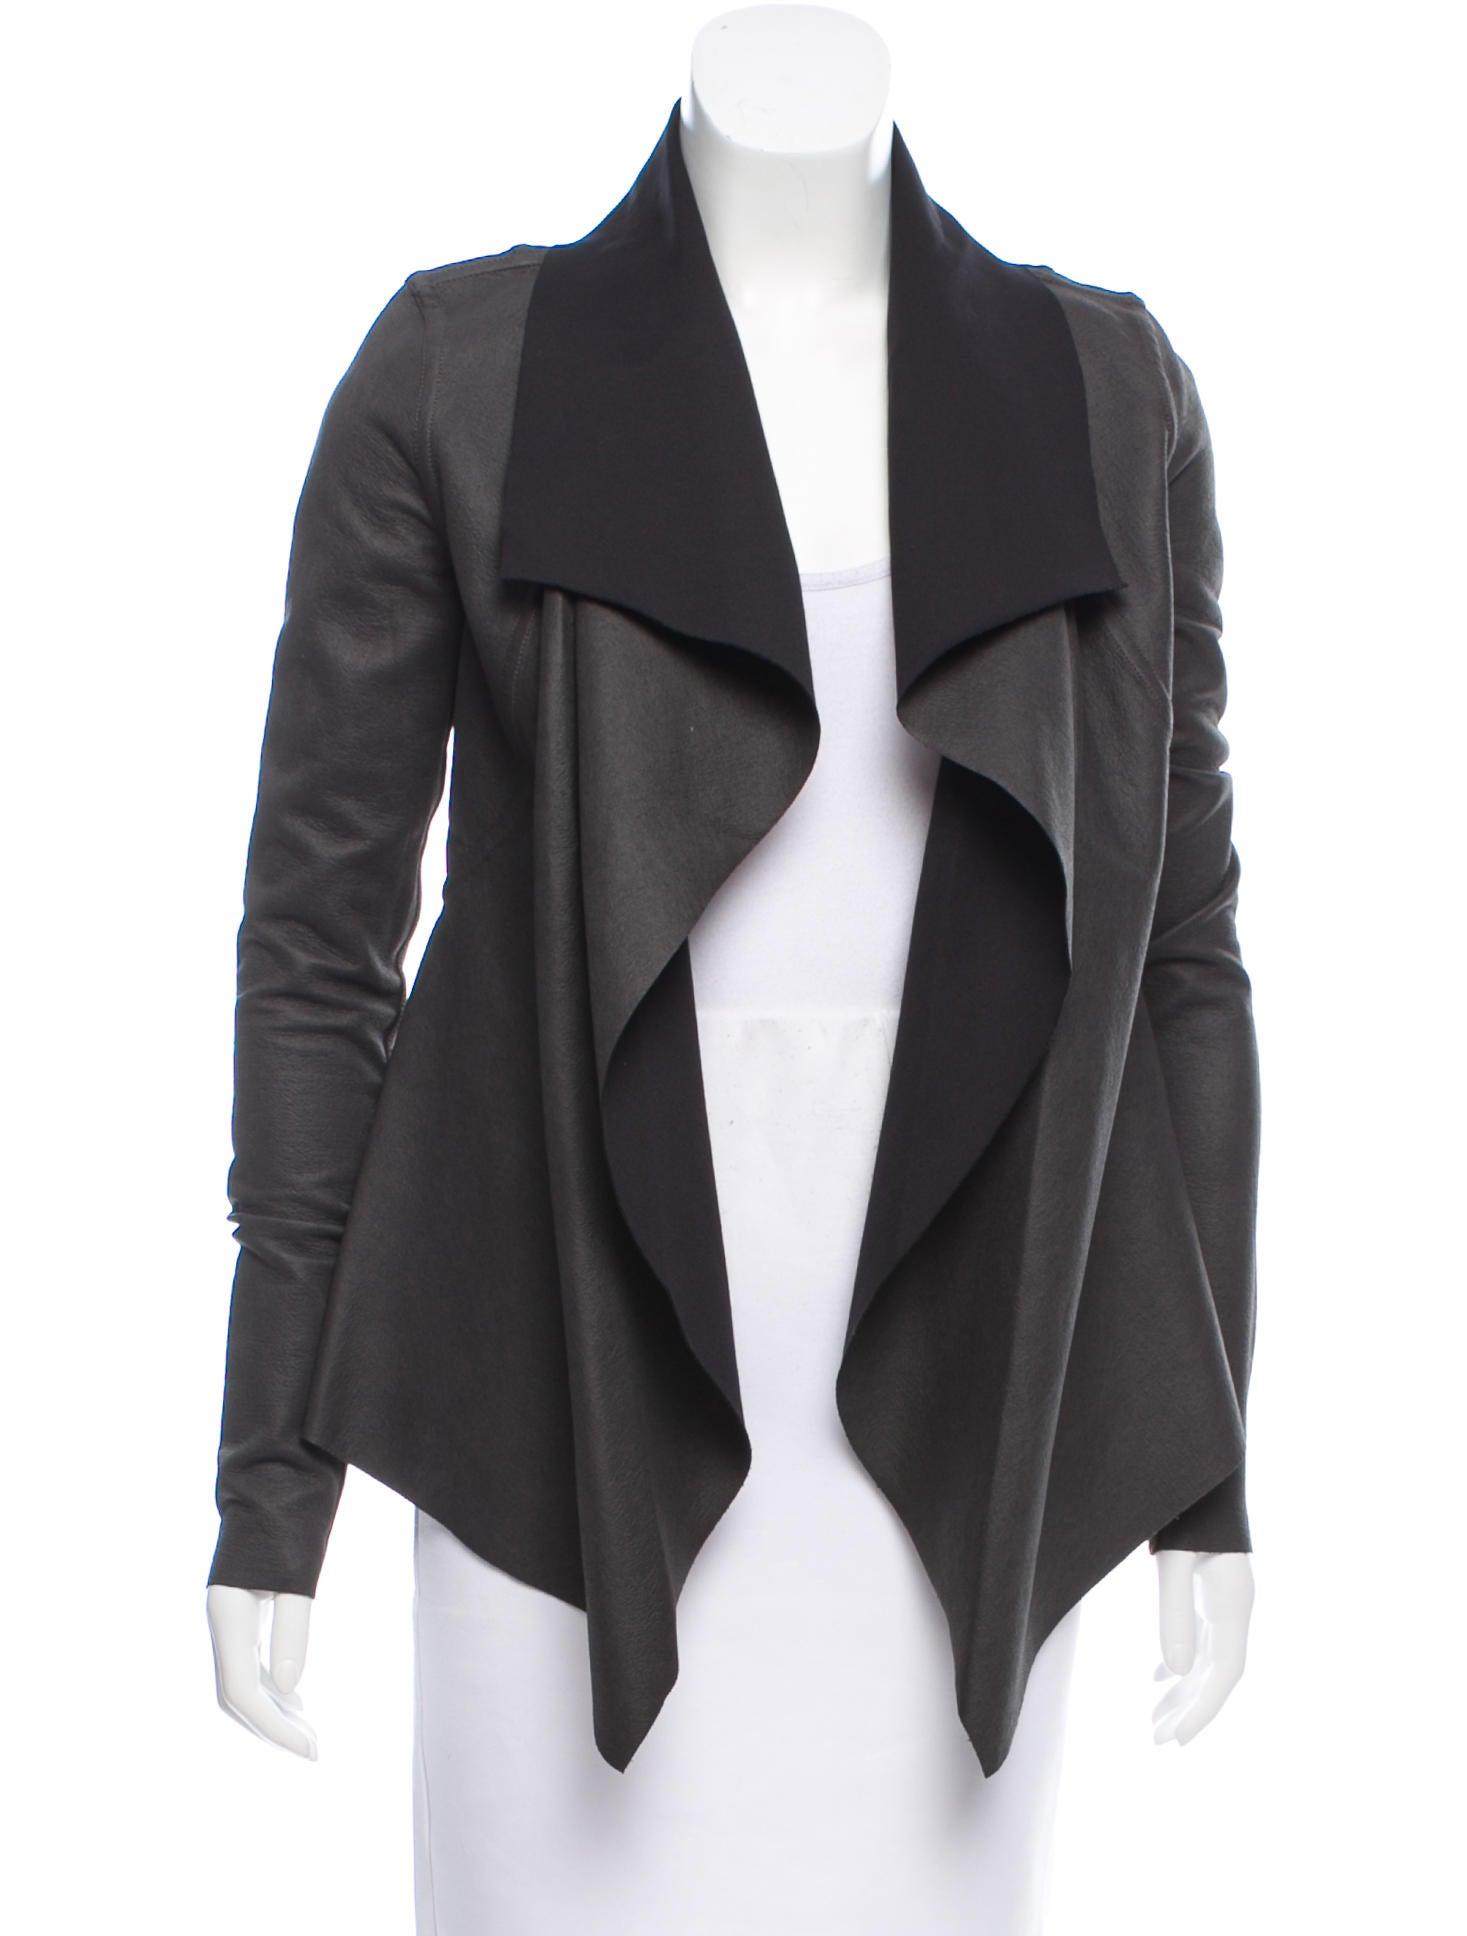 drapes gwynnie bee copy draped products angled rachel jacket roy mul